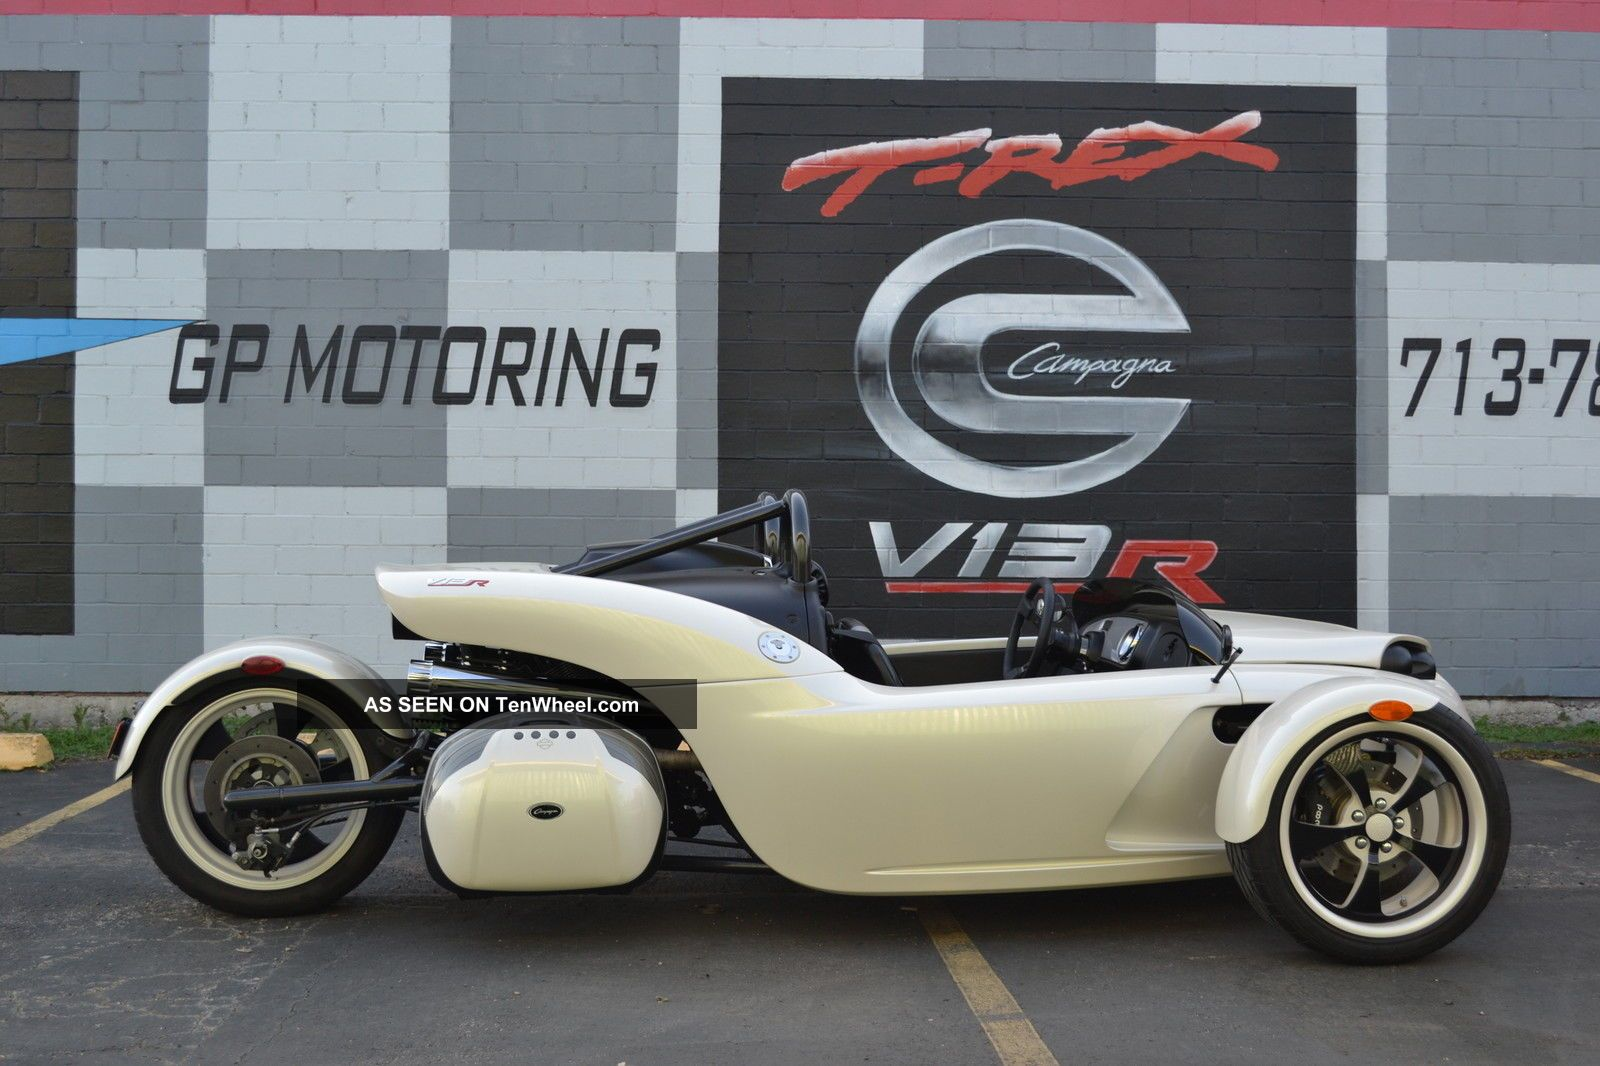 2011 Campagna V13r Pearl White